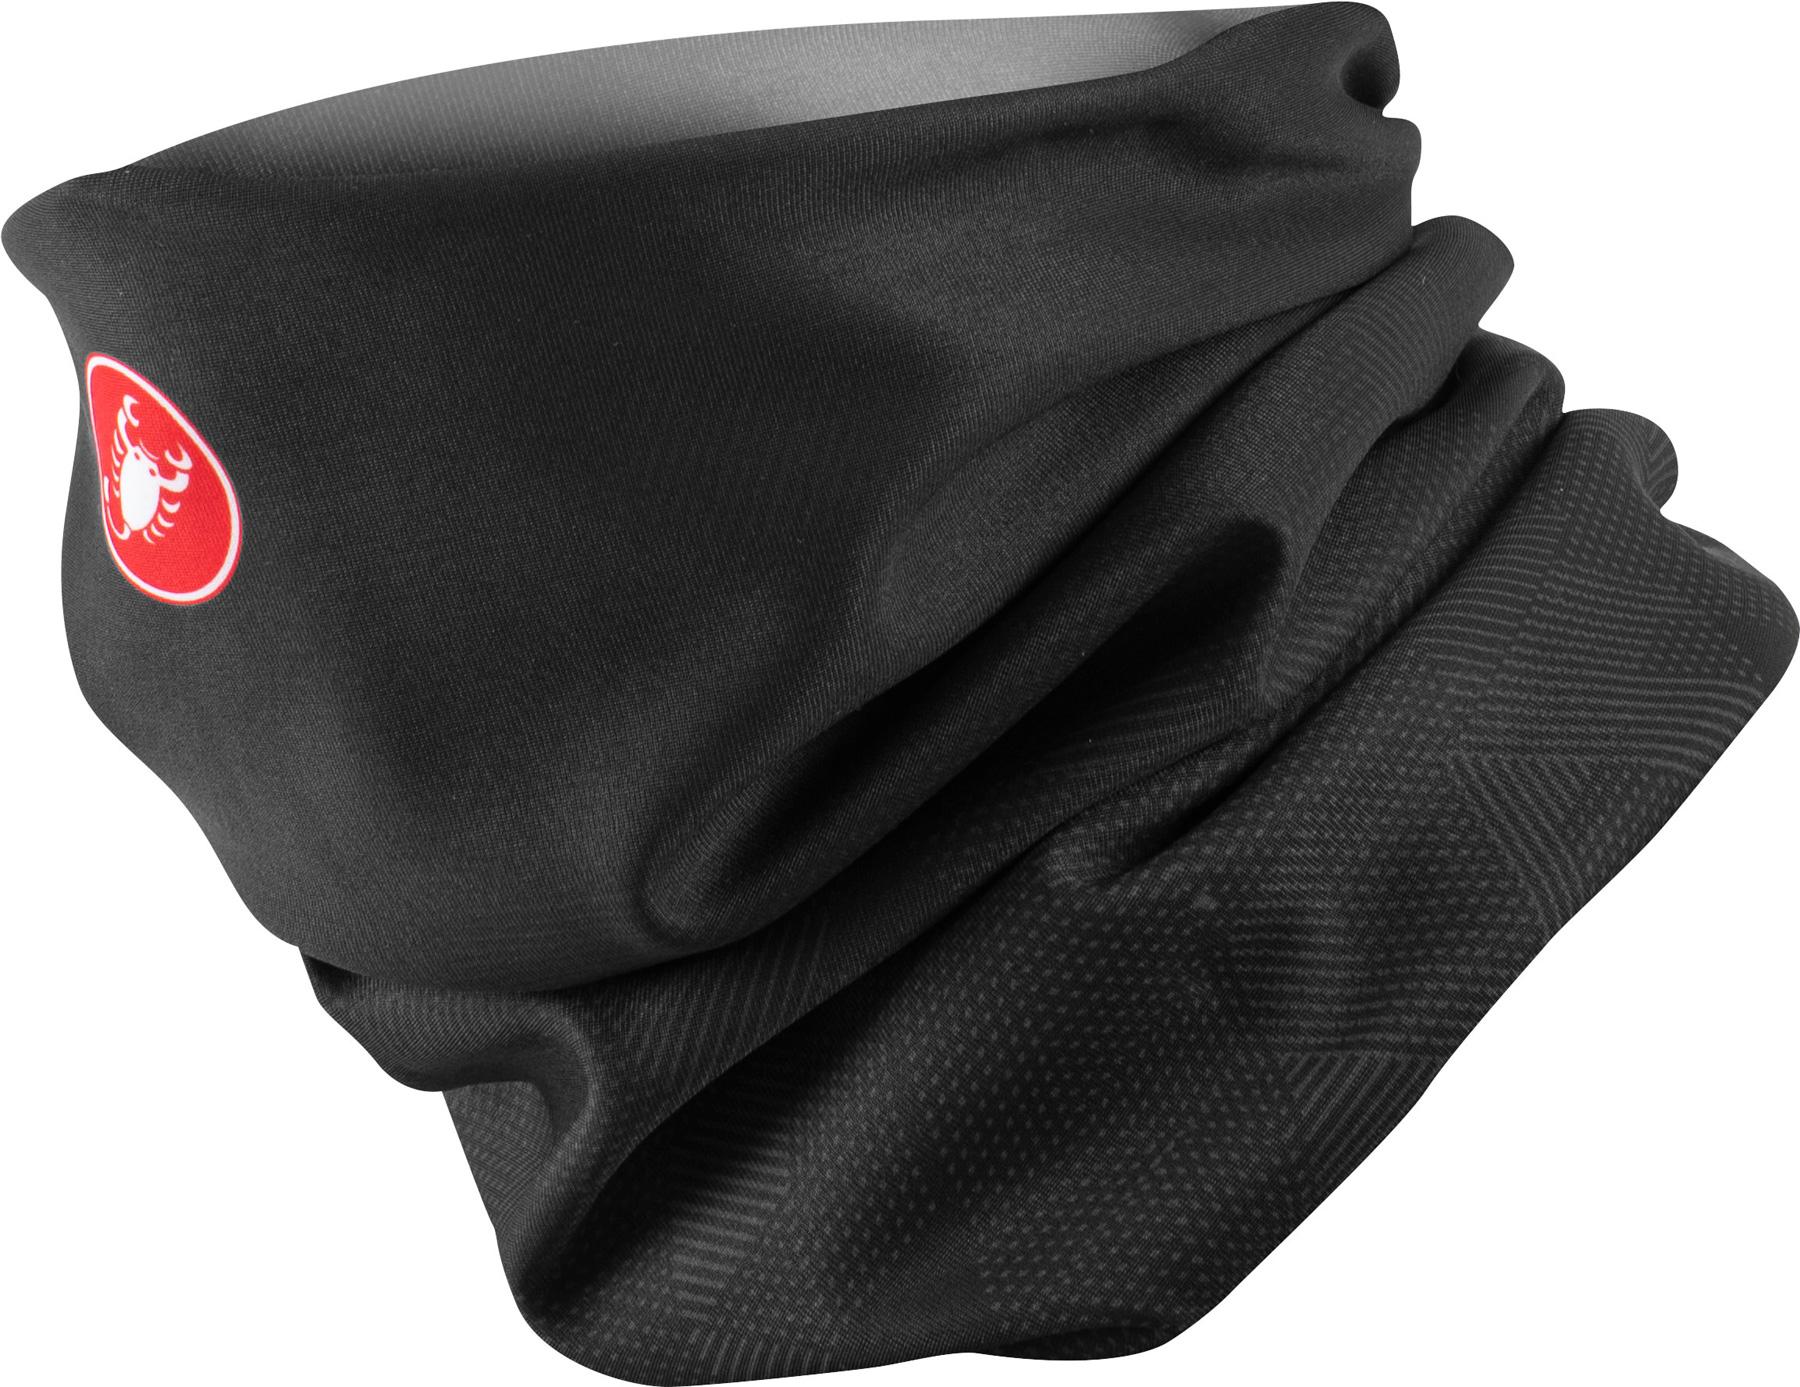 Produktbild von Castelli Pro Thermal Head Thingy - light black 085